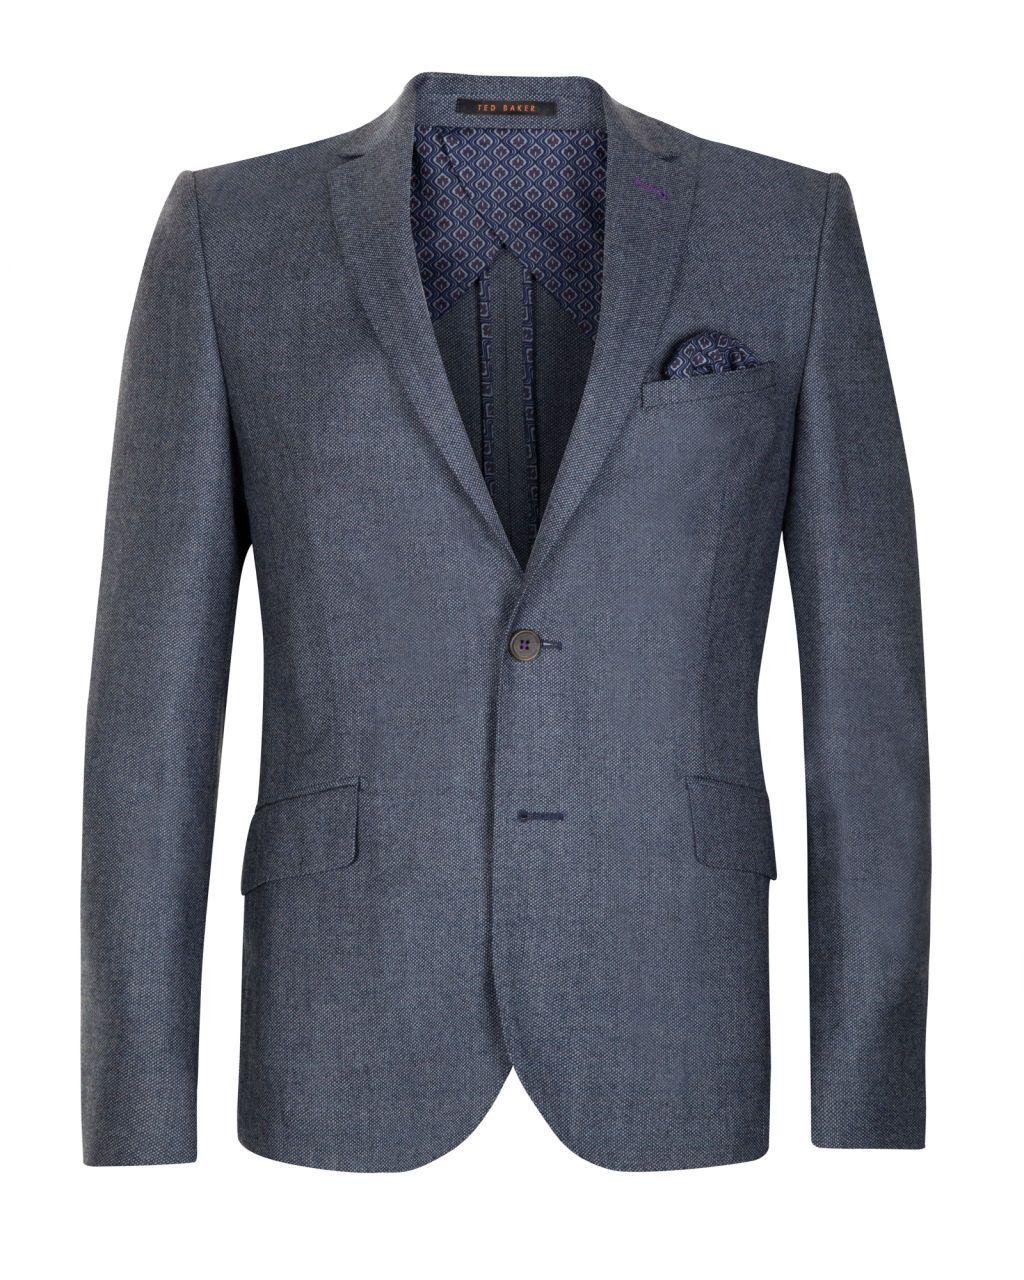 c2f766665072 Birdseye deconstructed suit jacket - Light Blue